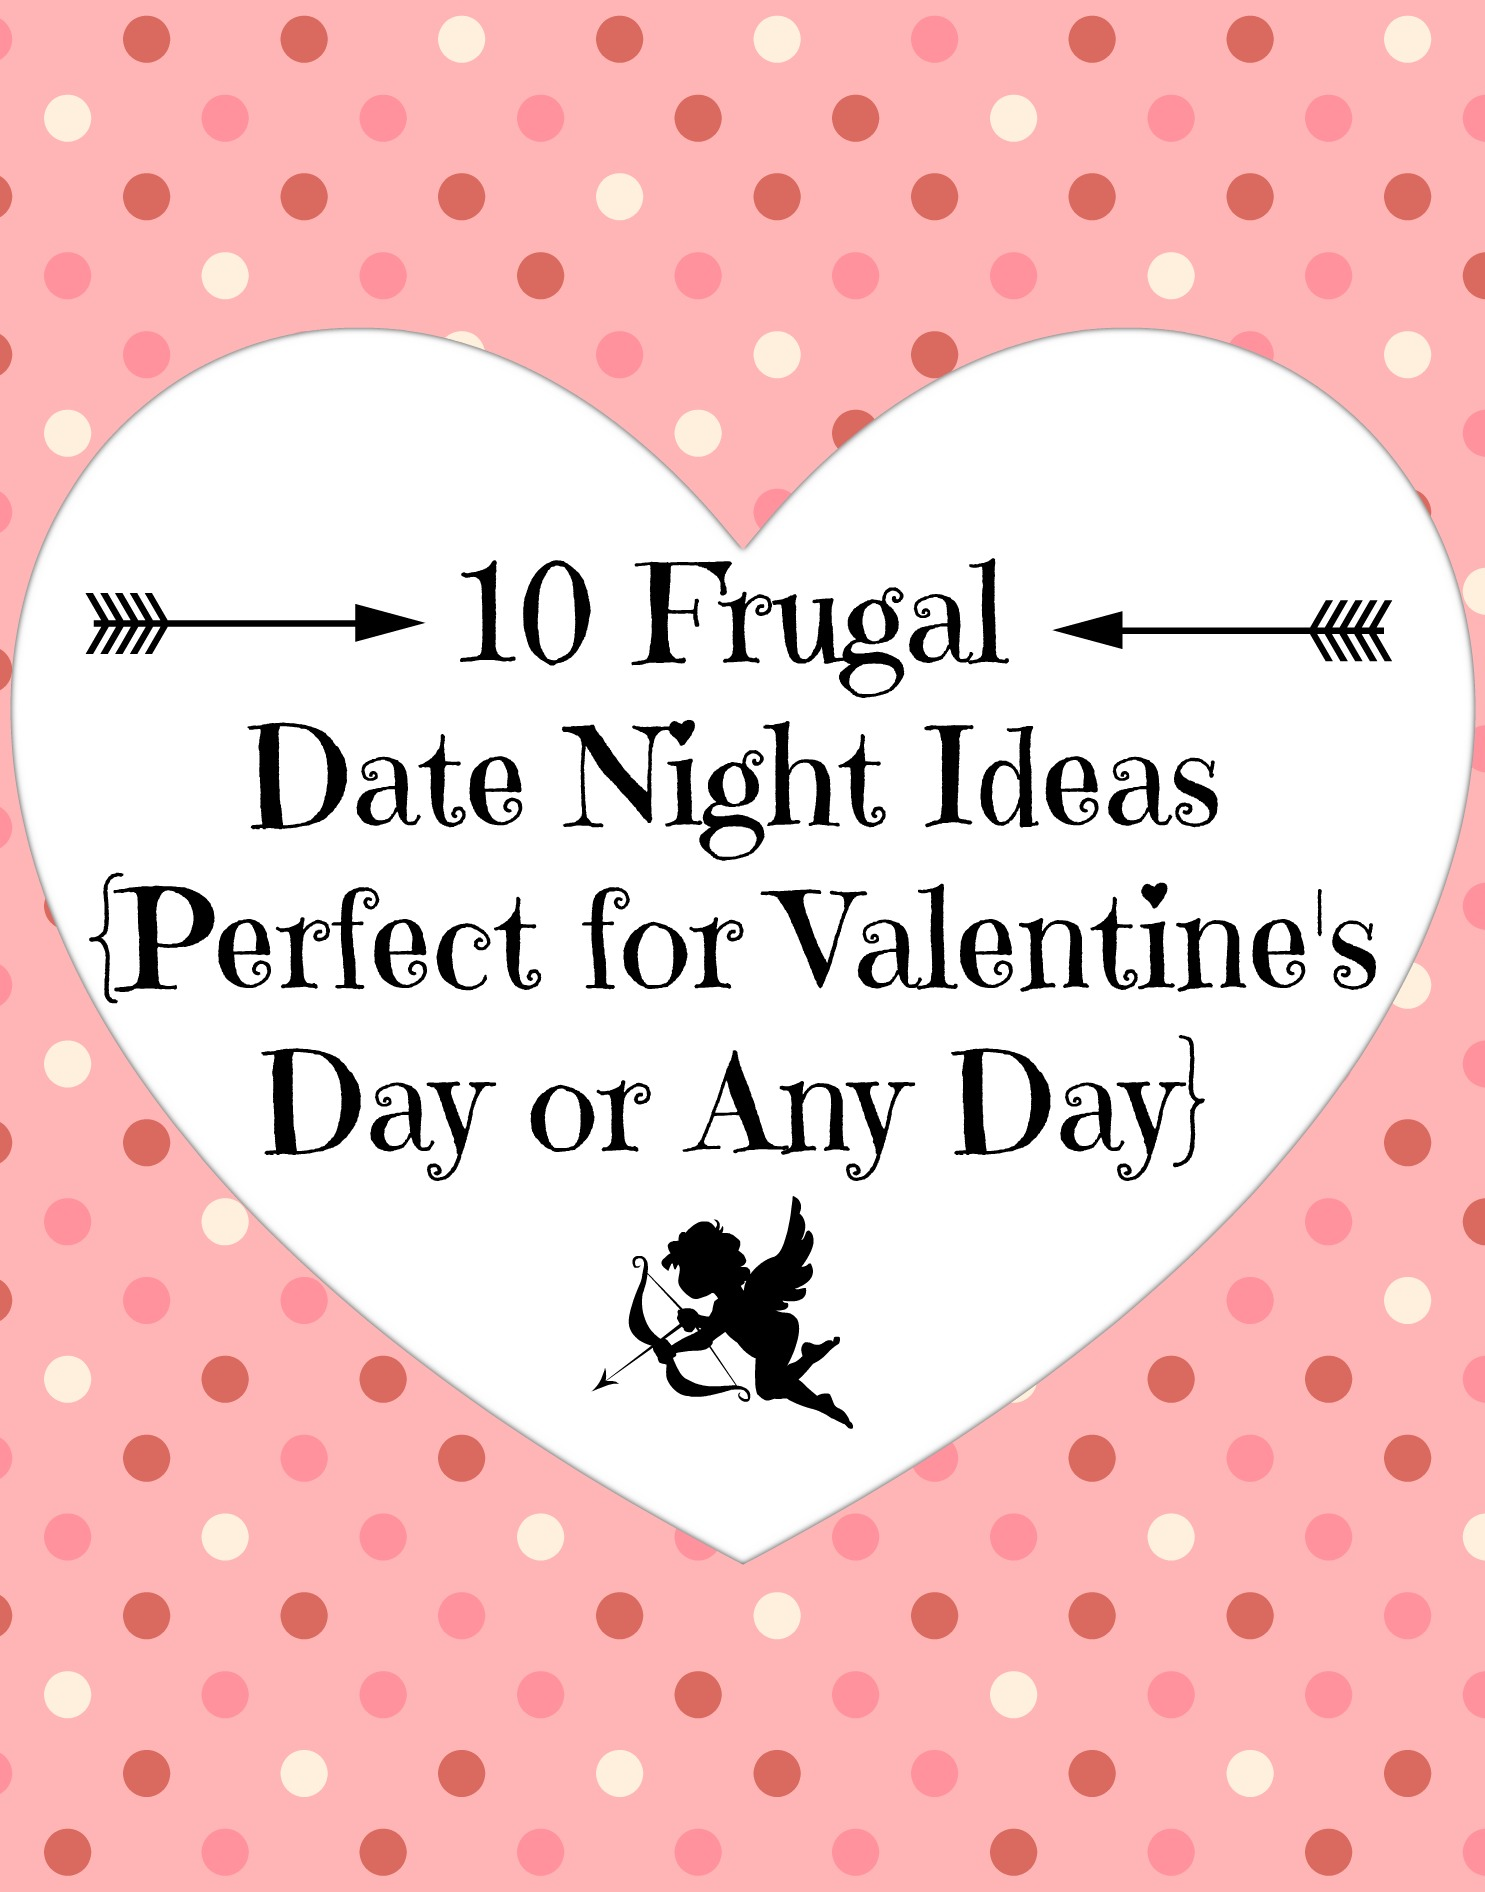 Friday night date ideas